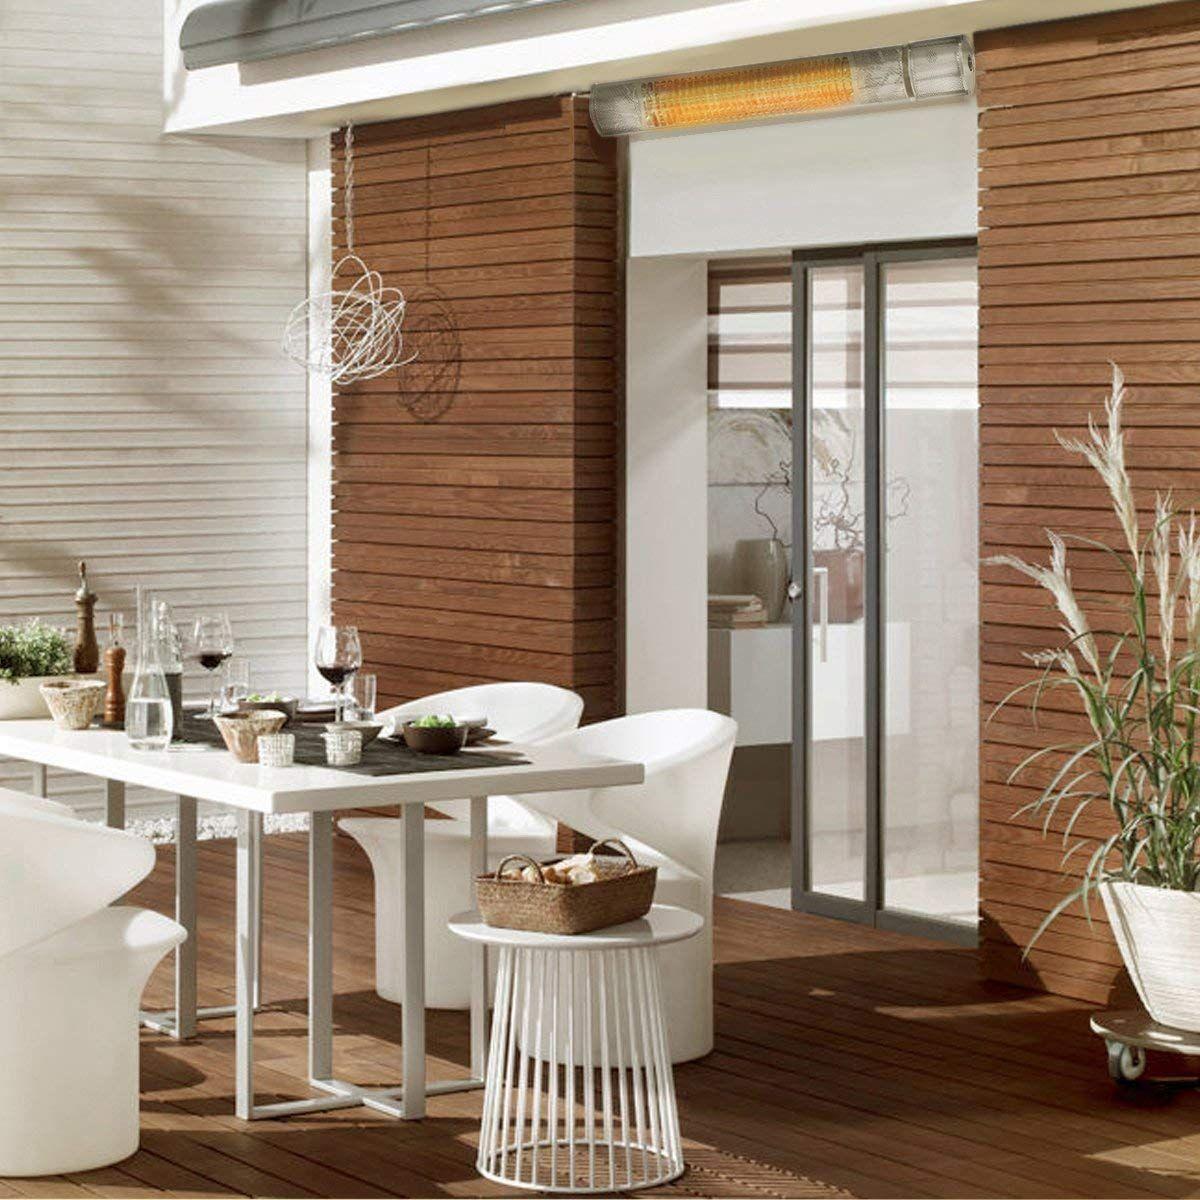 Xtremepowerus watt wall mounted infrared heater indooroutdoor